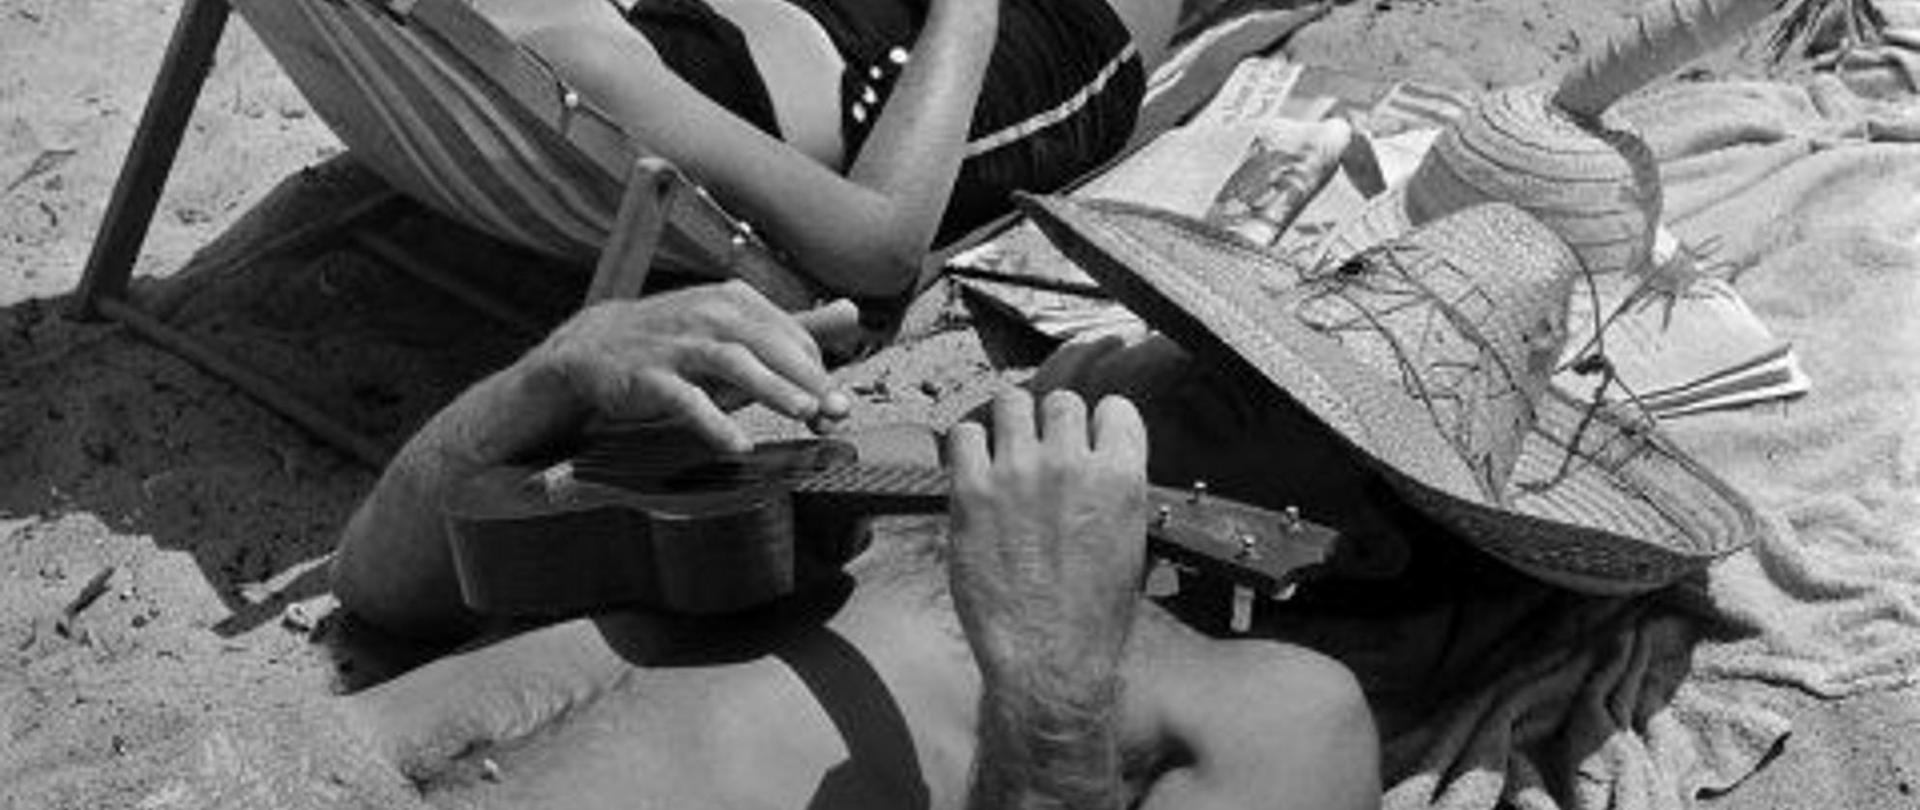 beach-bums-san-onofre-calif-1950-6.jpg